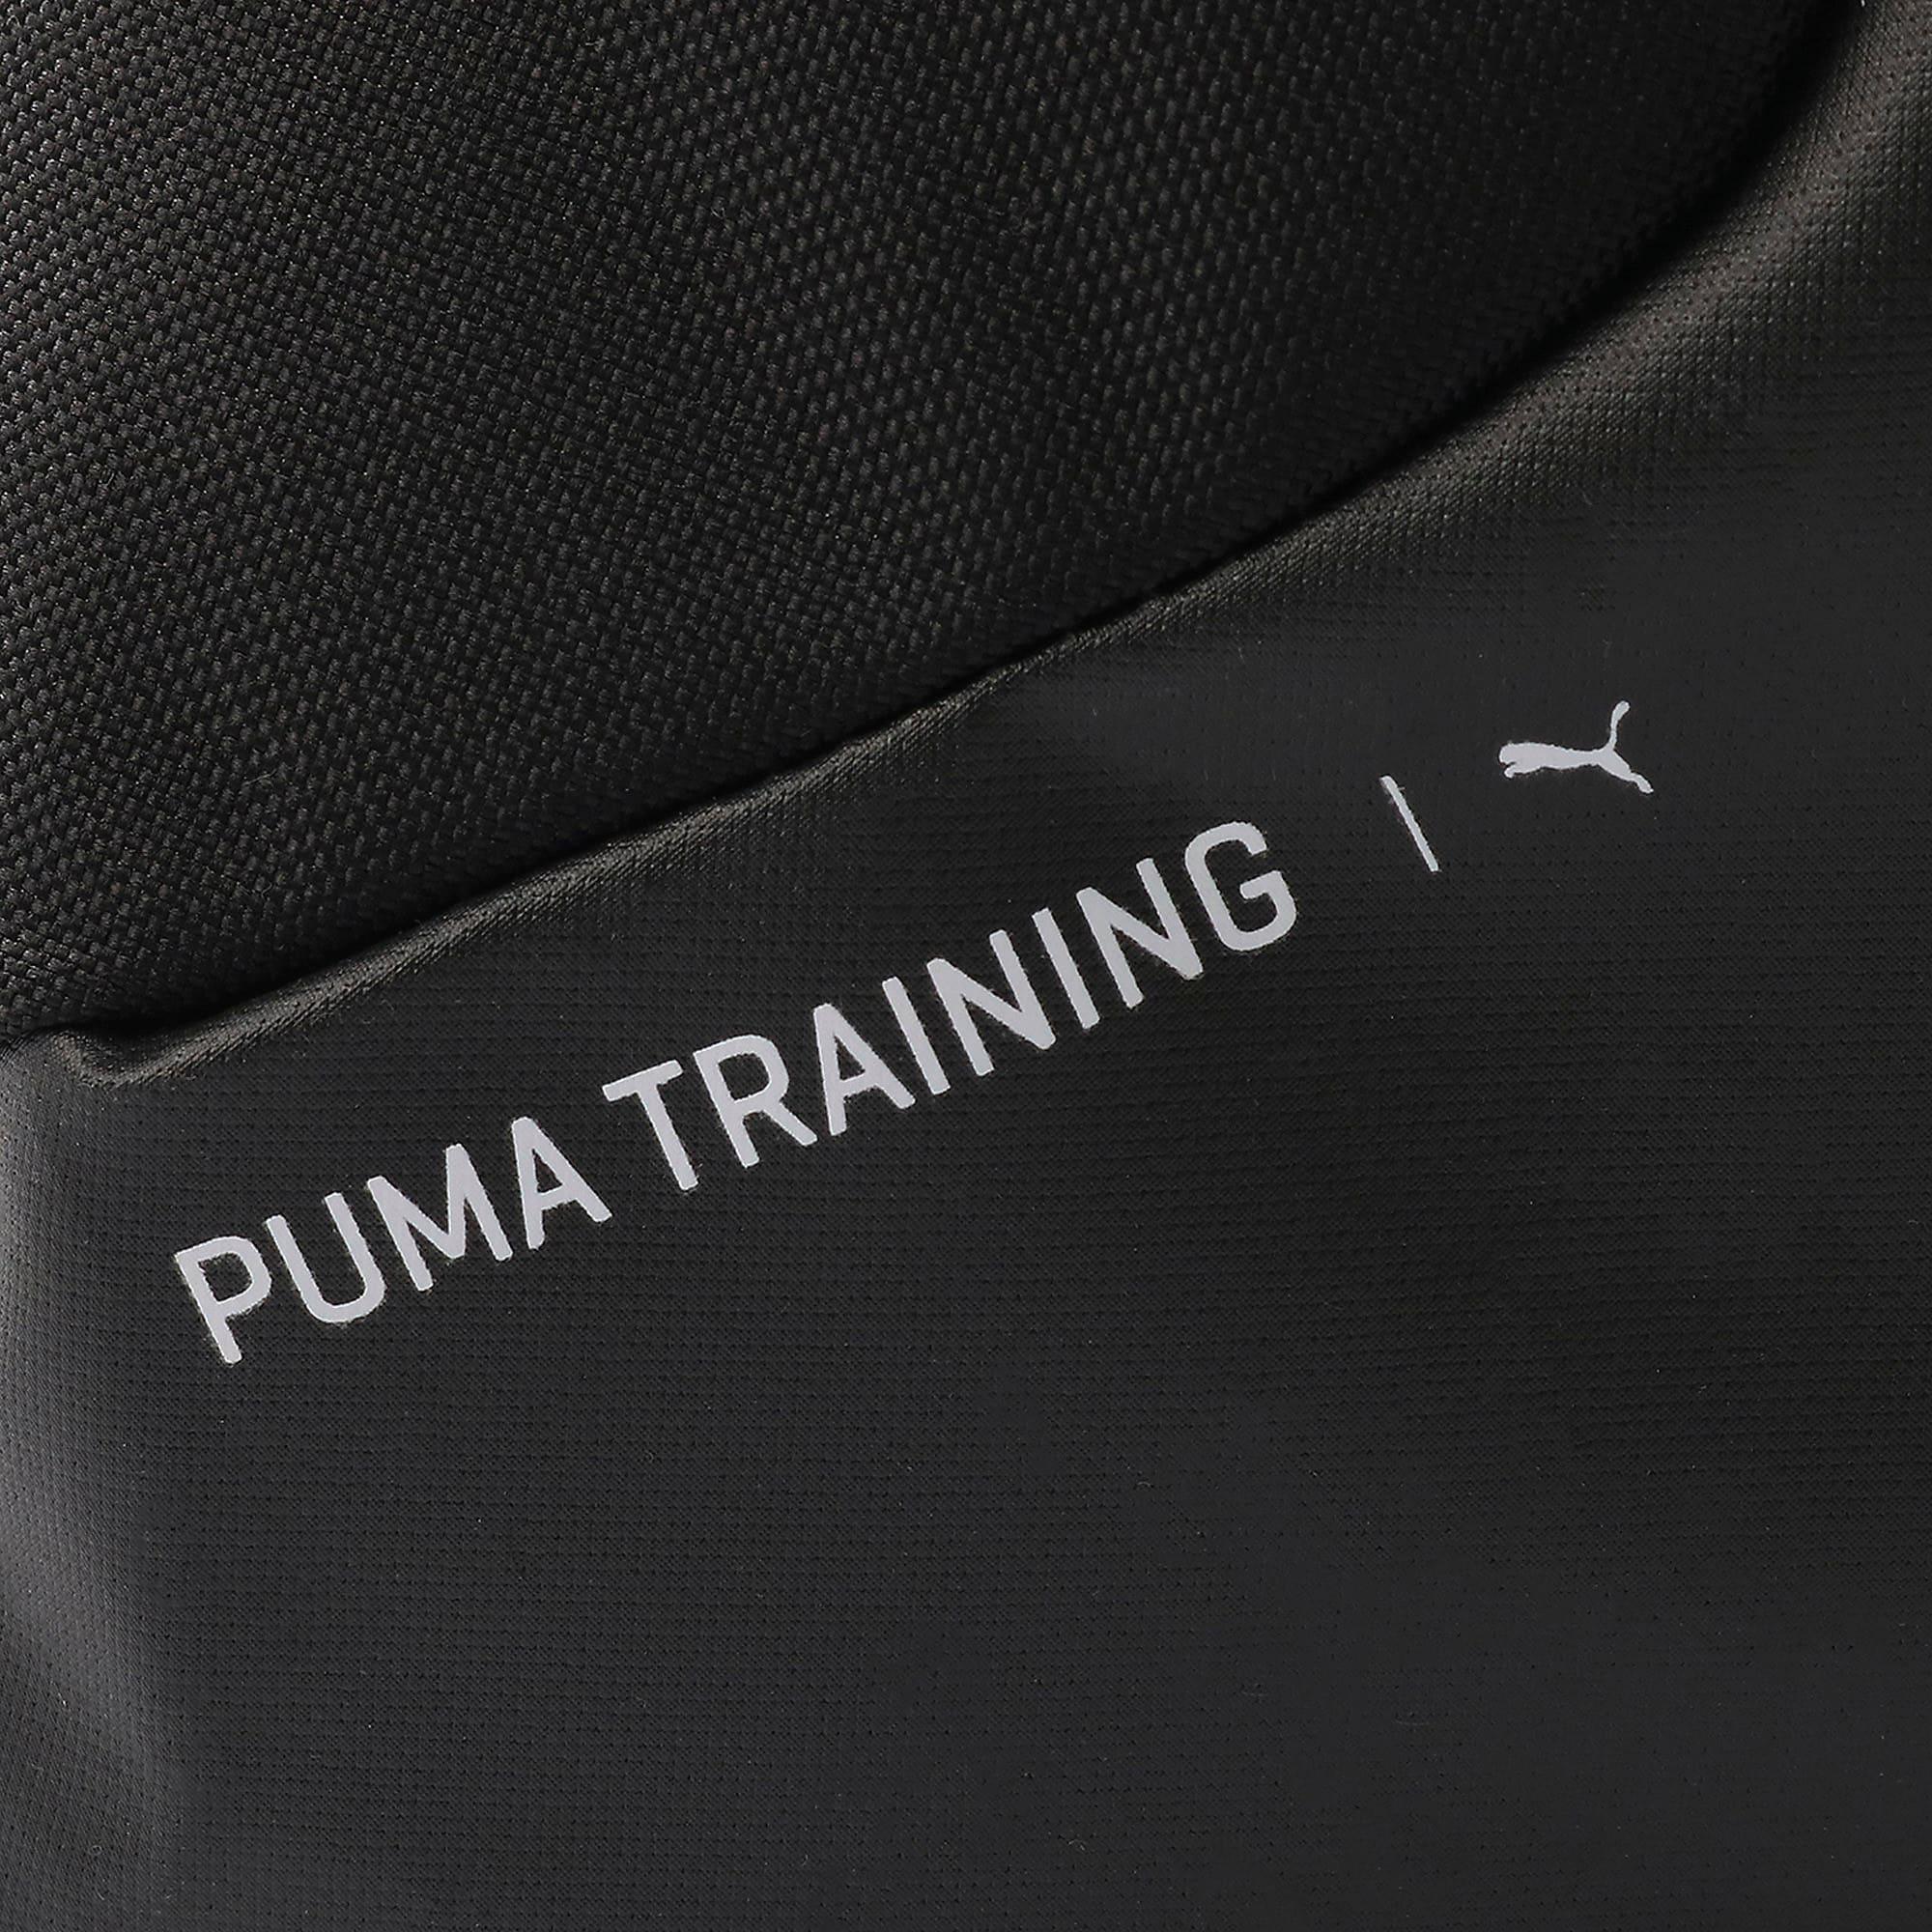 Thumbnail 12 of ジム ダッフル バッグ M 40L, Puma Black, medium-JPN